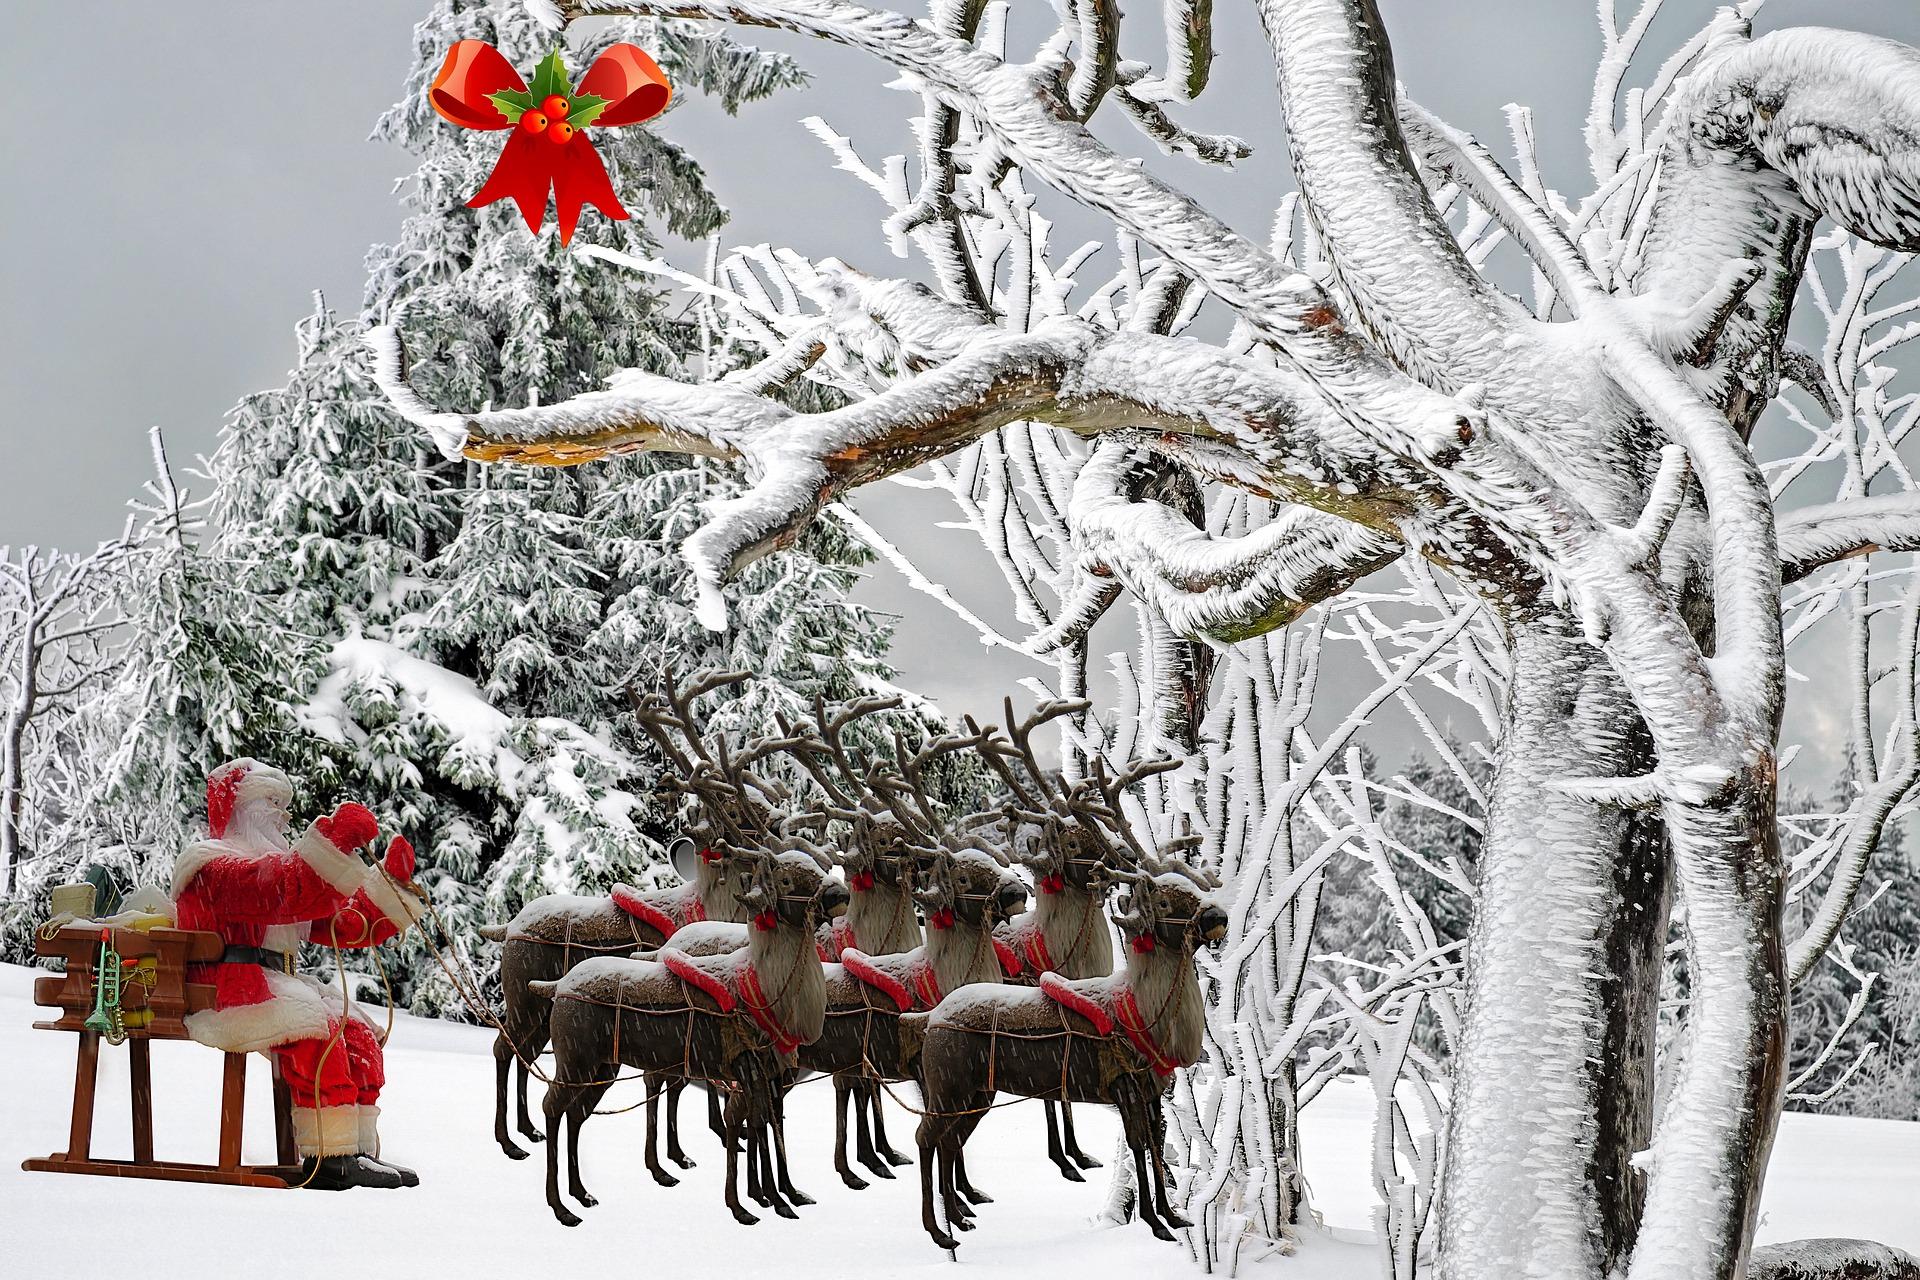 Santa with Reindeer preparing for Chrismas